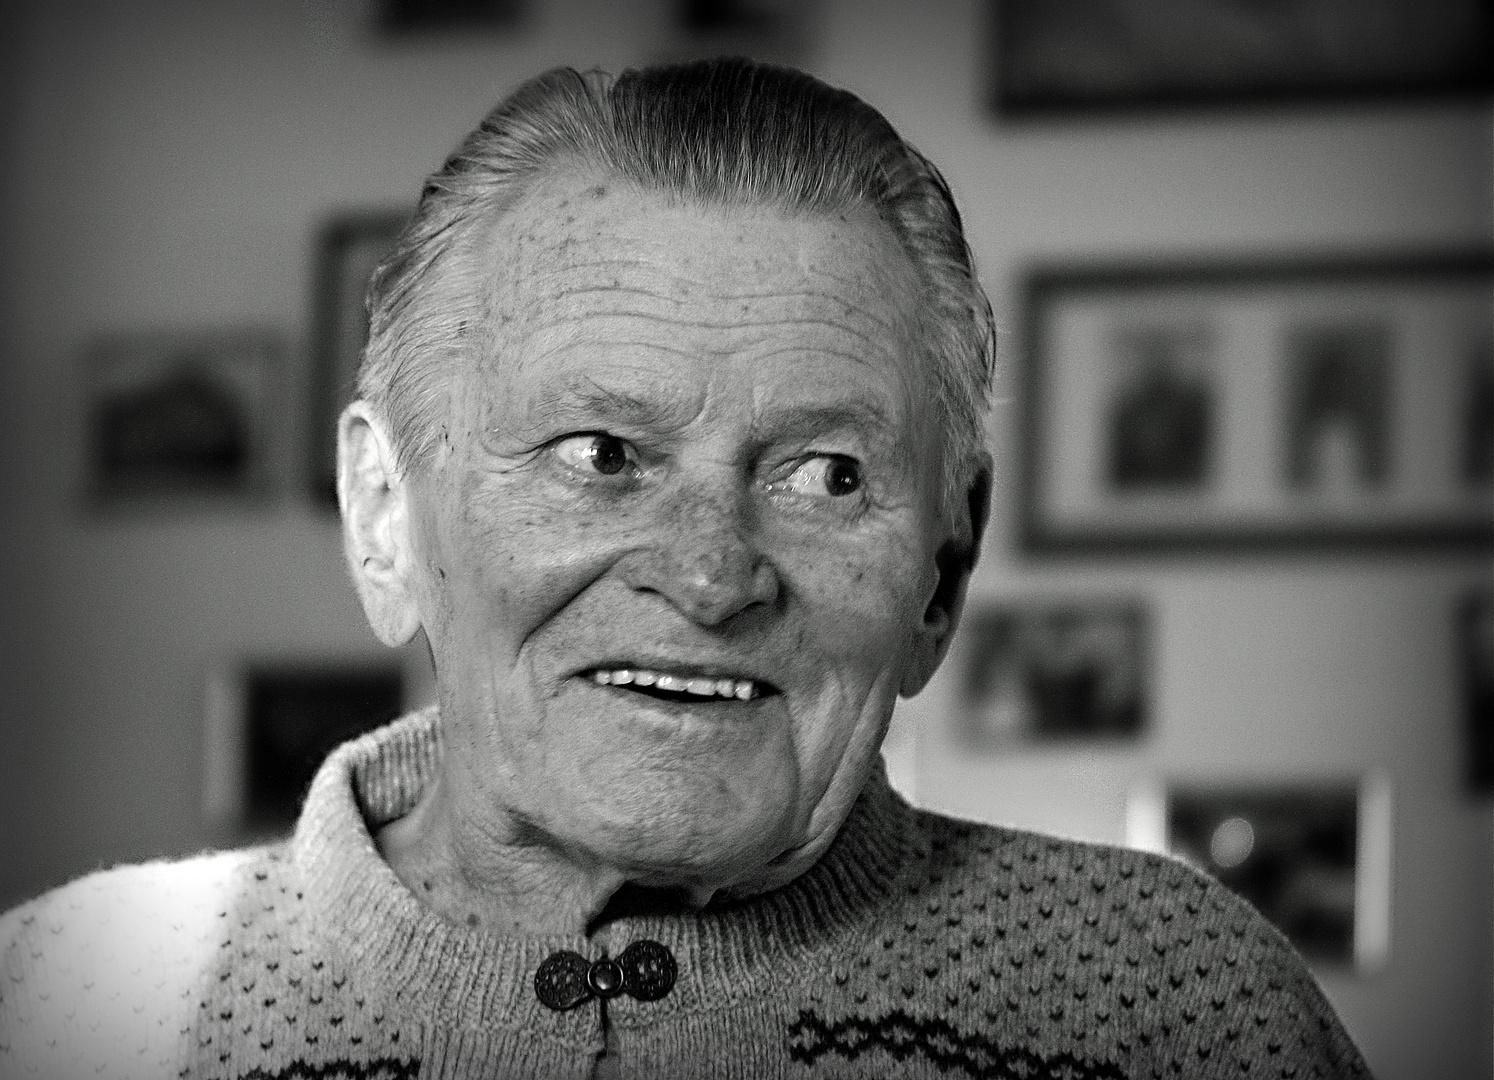 Karl Perenthaler: 1925 - 2013